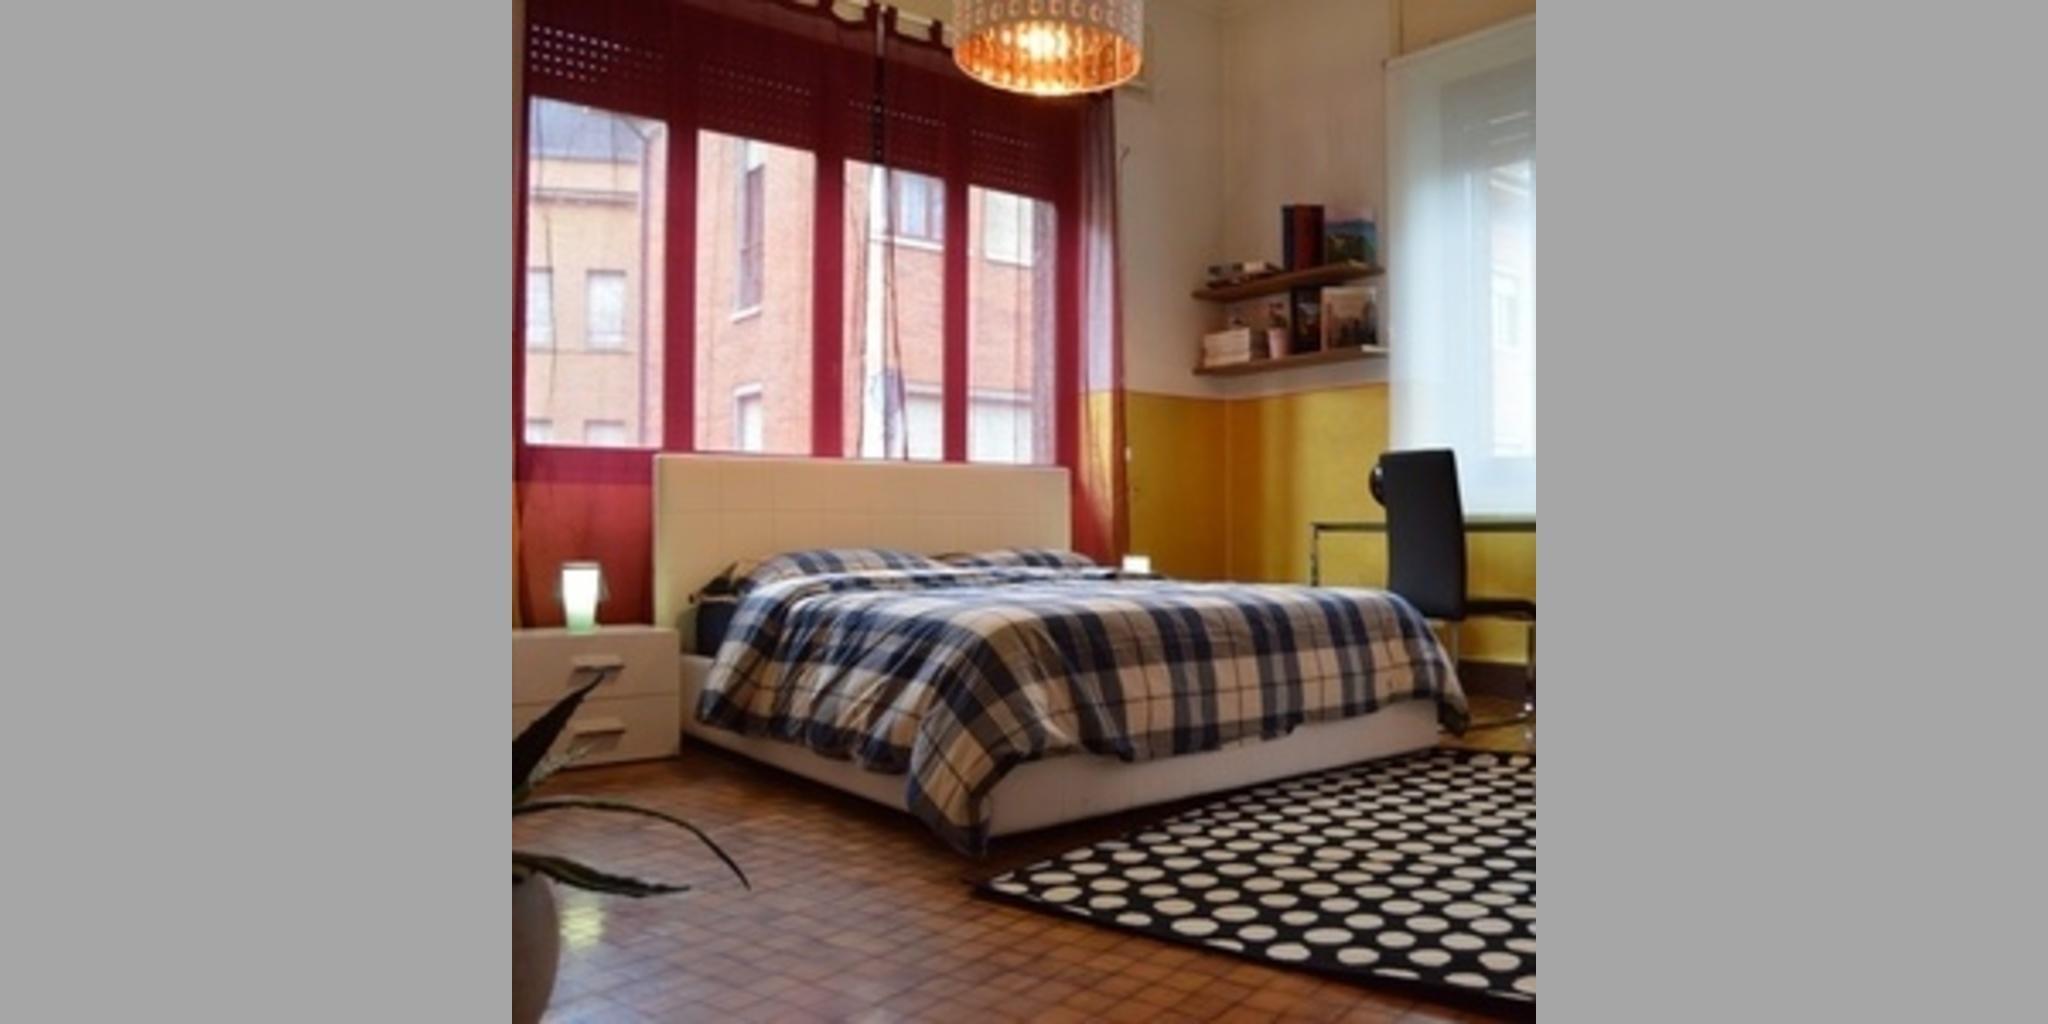 Bed & Breakfast Pavia - Vicino Duomo